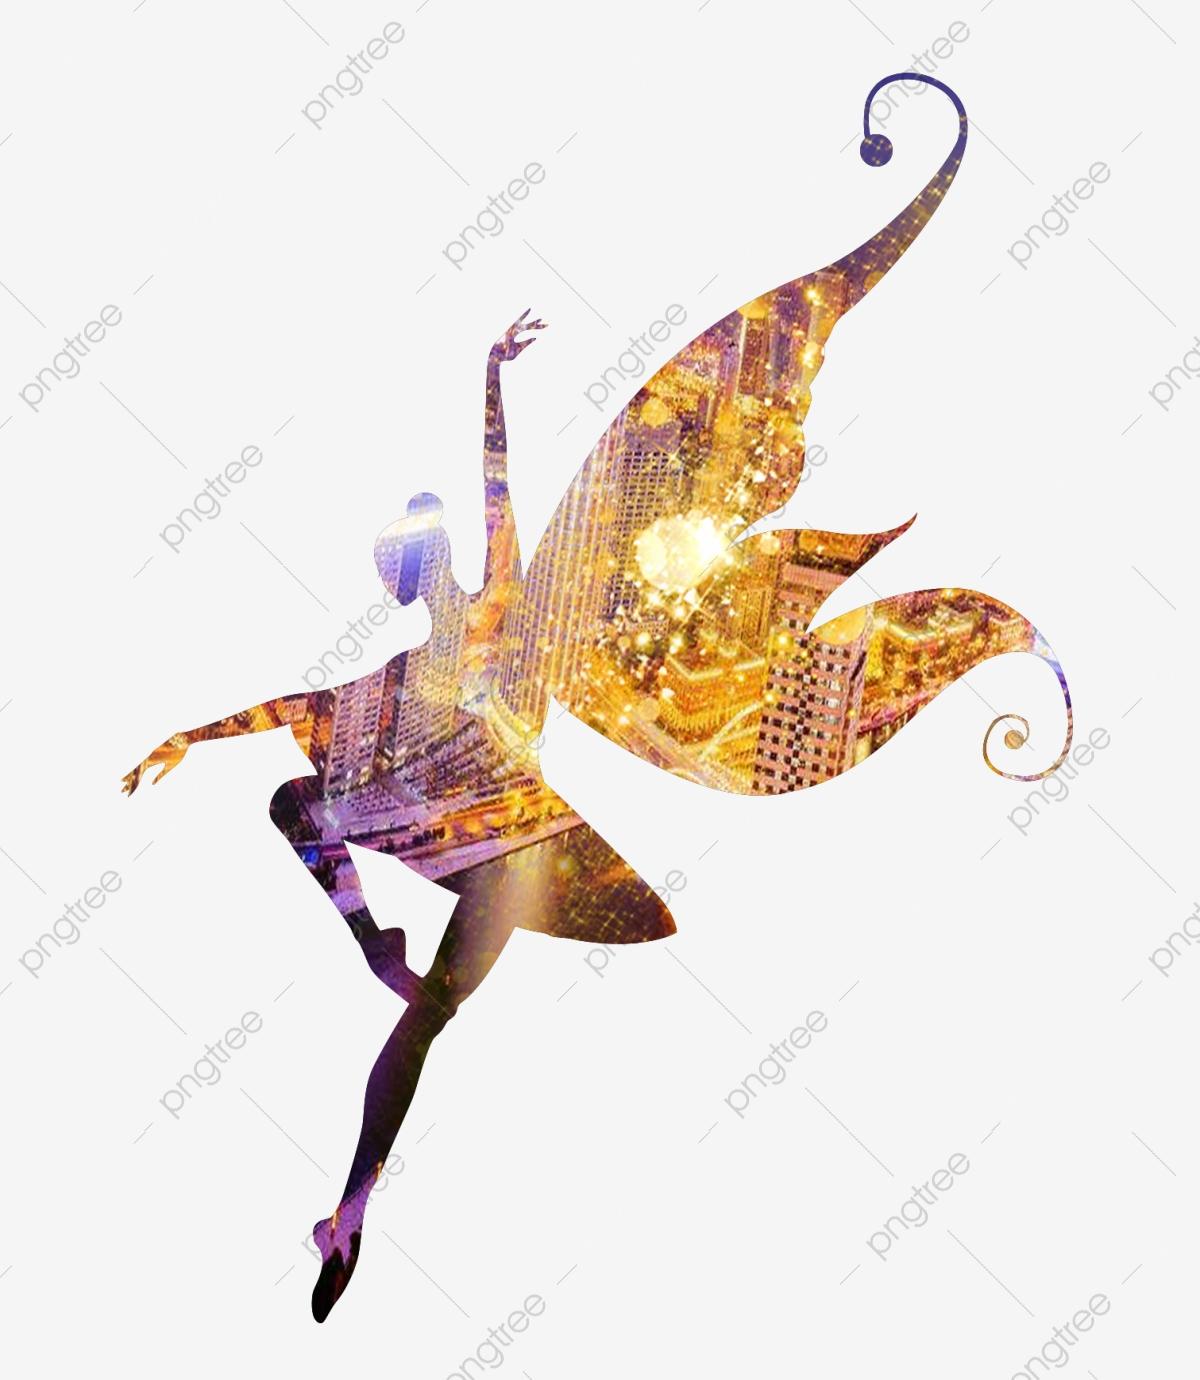 Girl Dancing Silhouette, Dancing Clipart, Girl Dancing, Dancing.